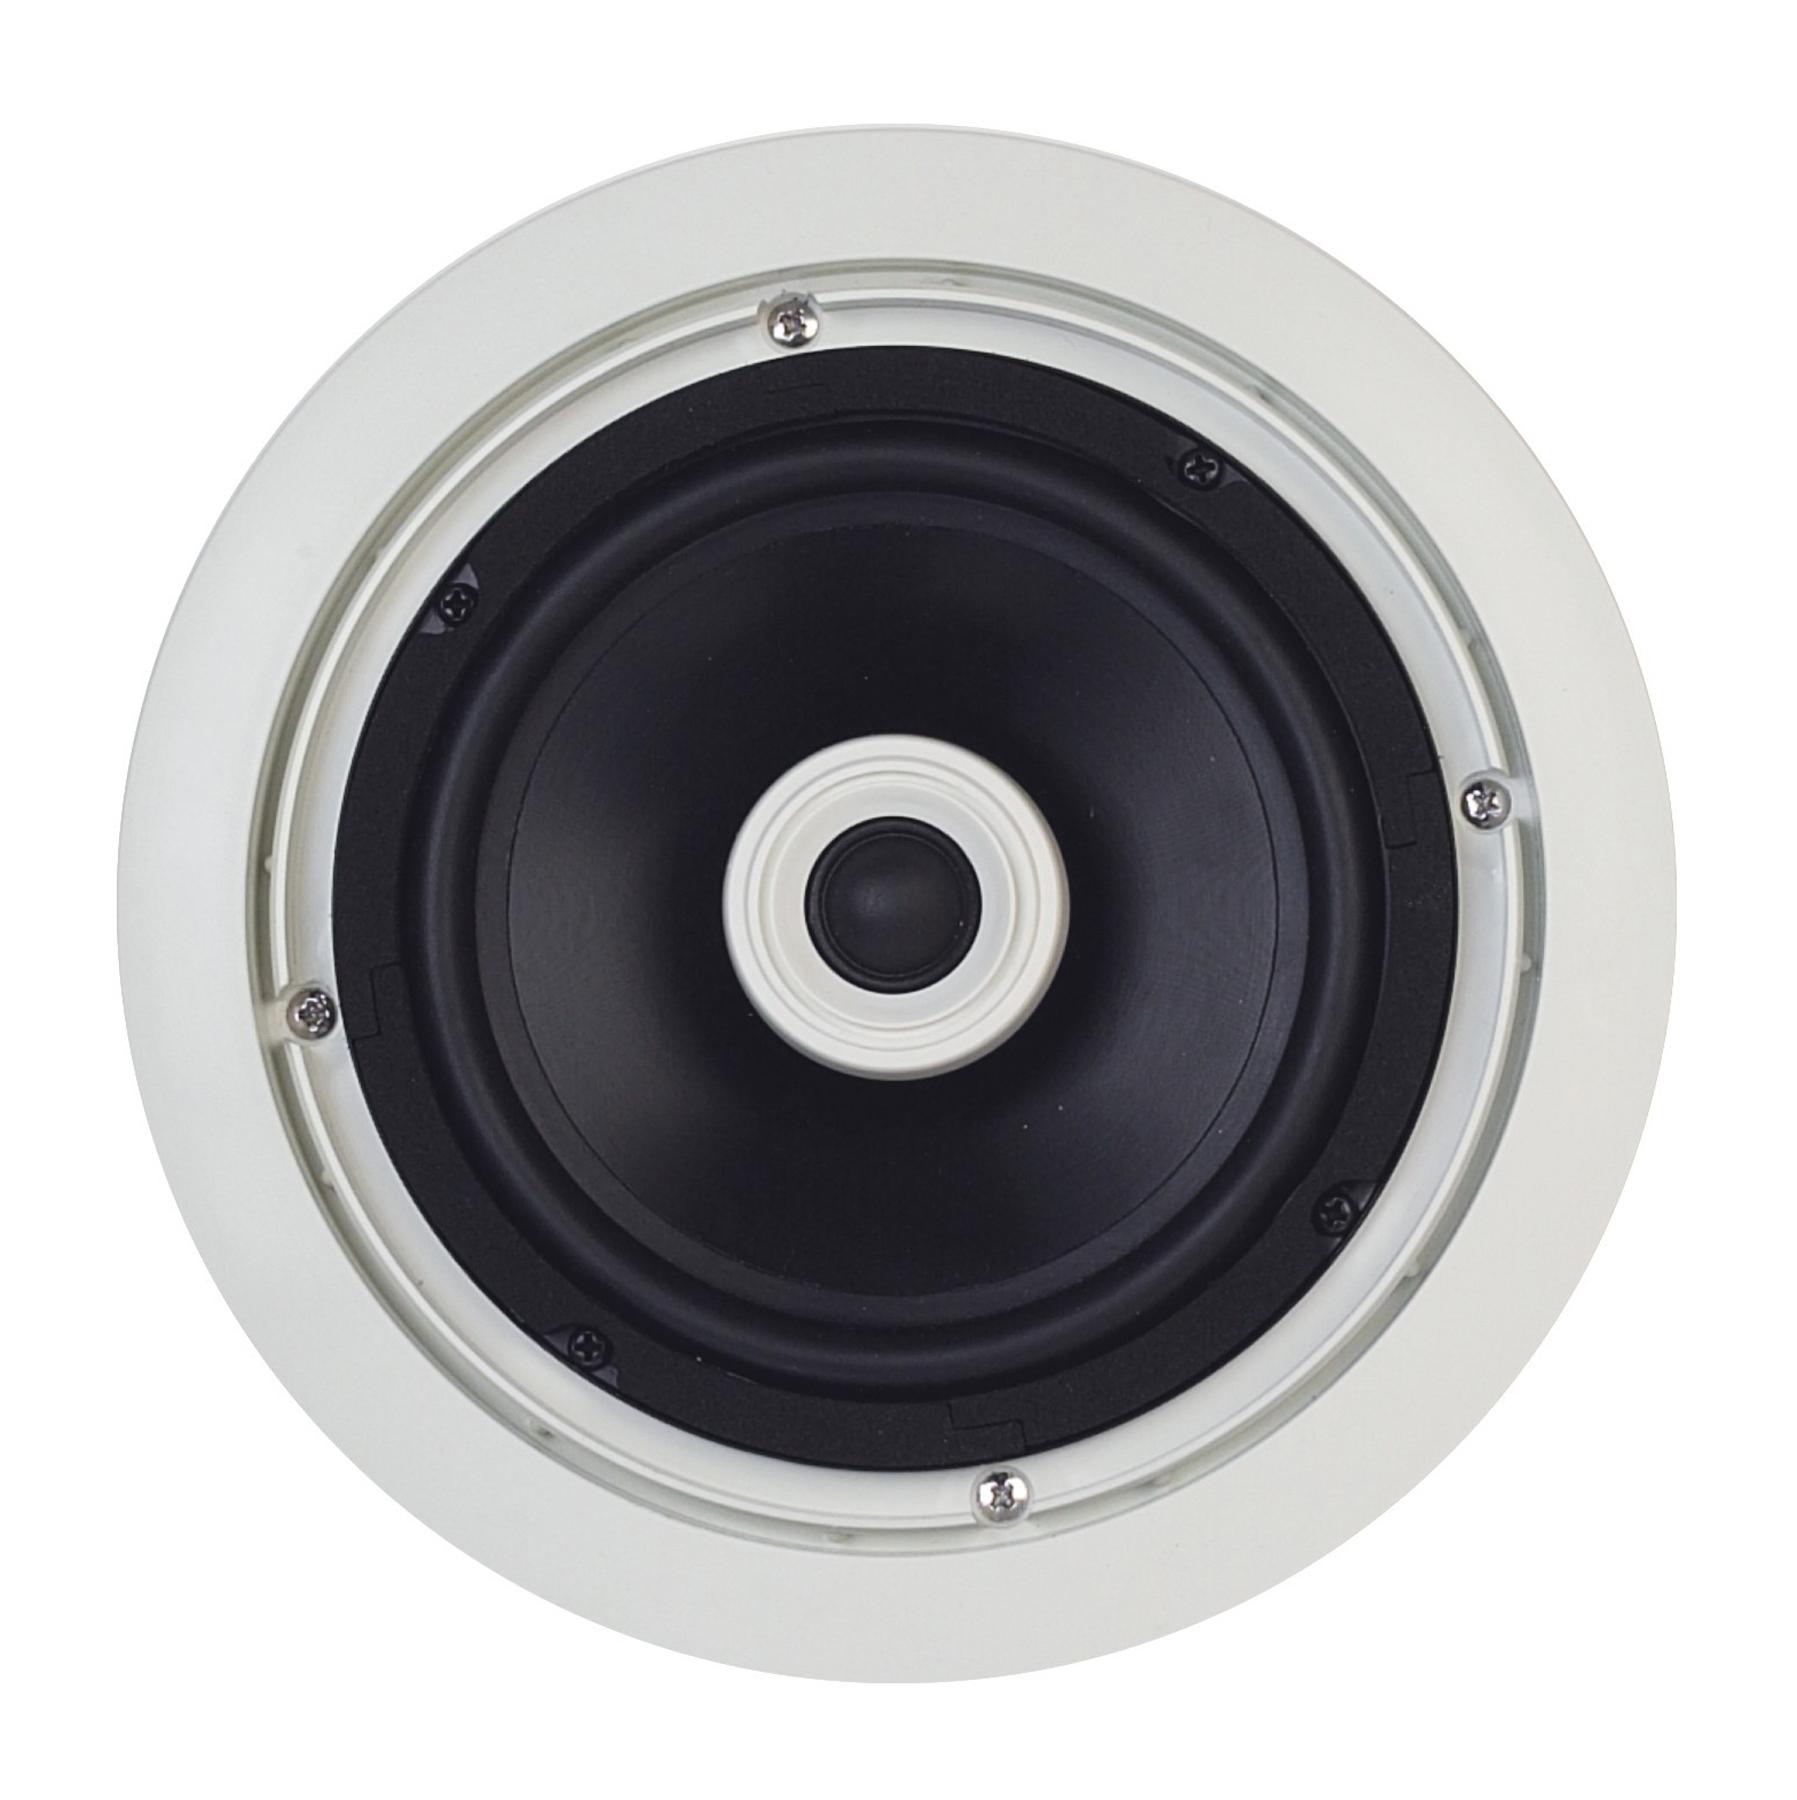 Sirkom Nv Ap16c Accentplus1 In Ceiling Speaker 6 5